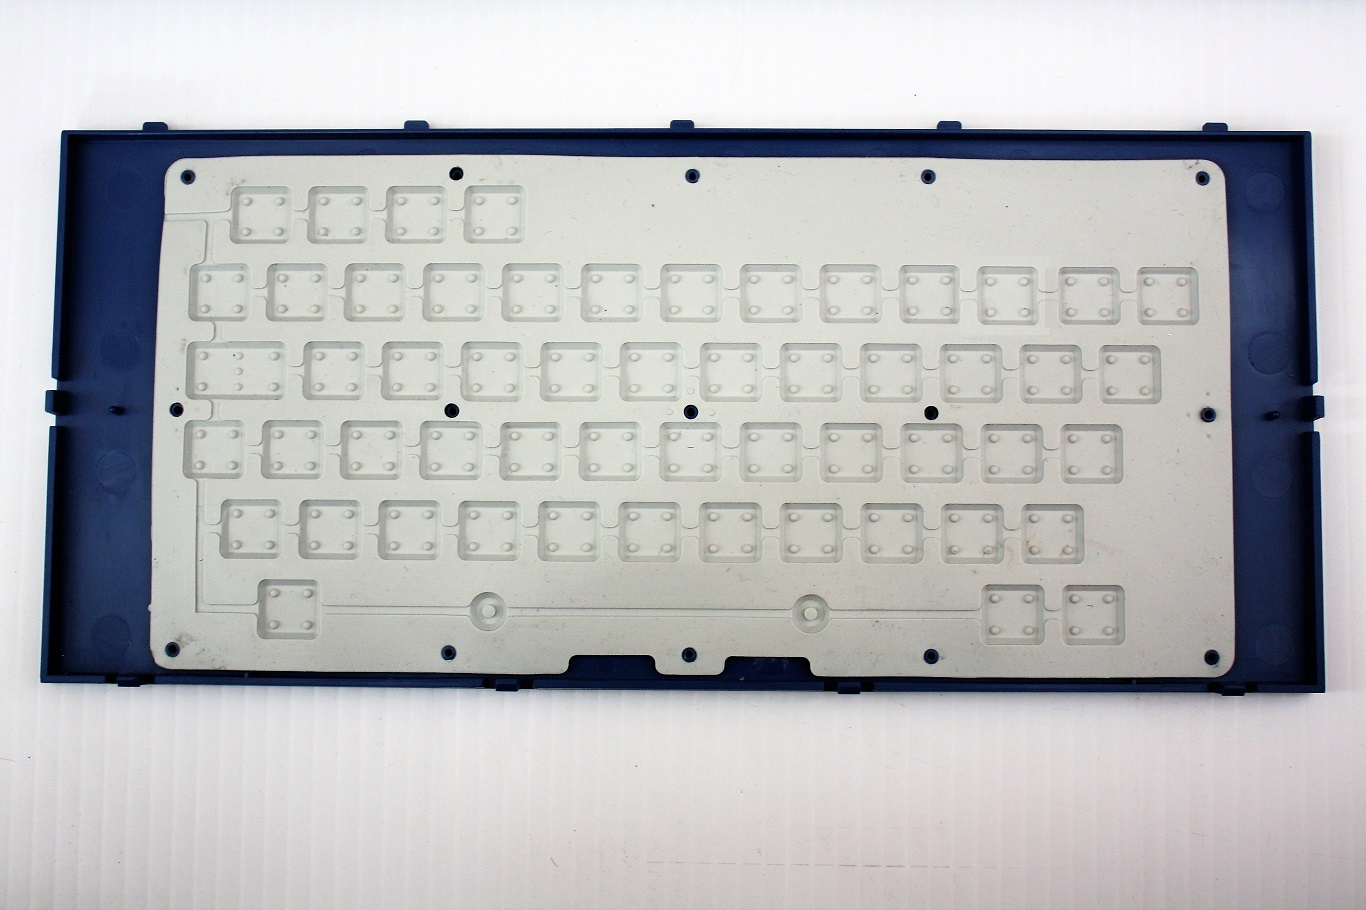 Tomy Tutor - keyboard rubber chicklet keys.JPG